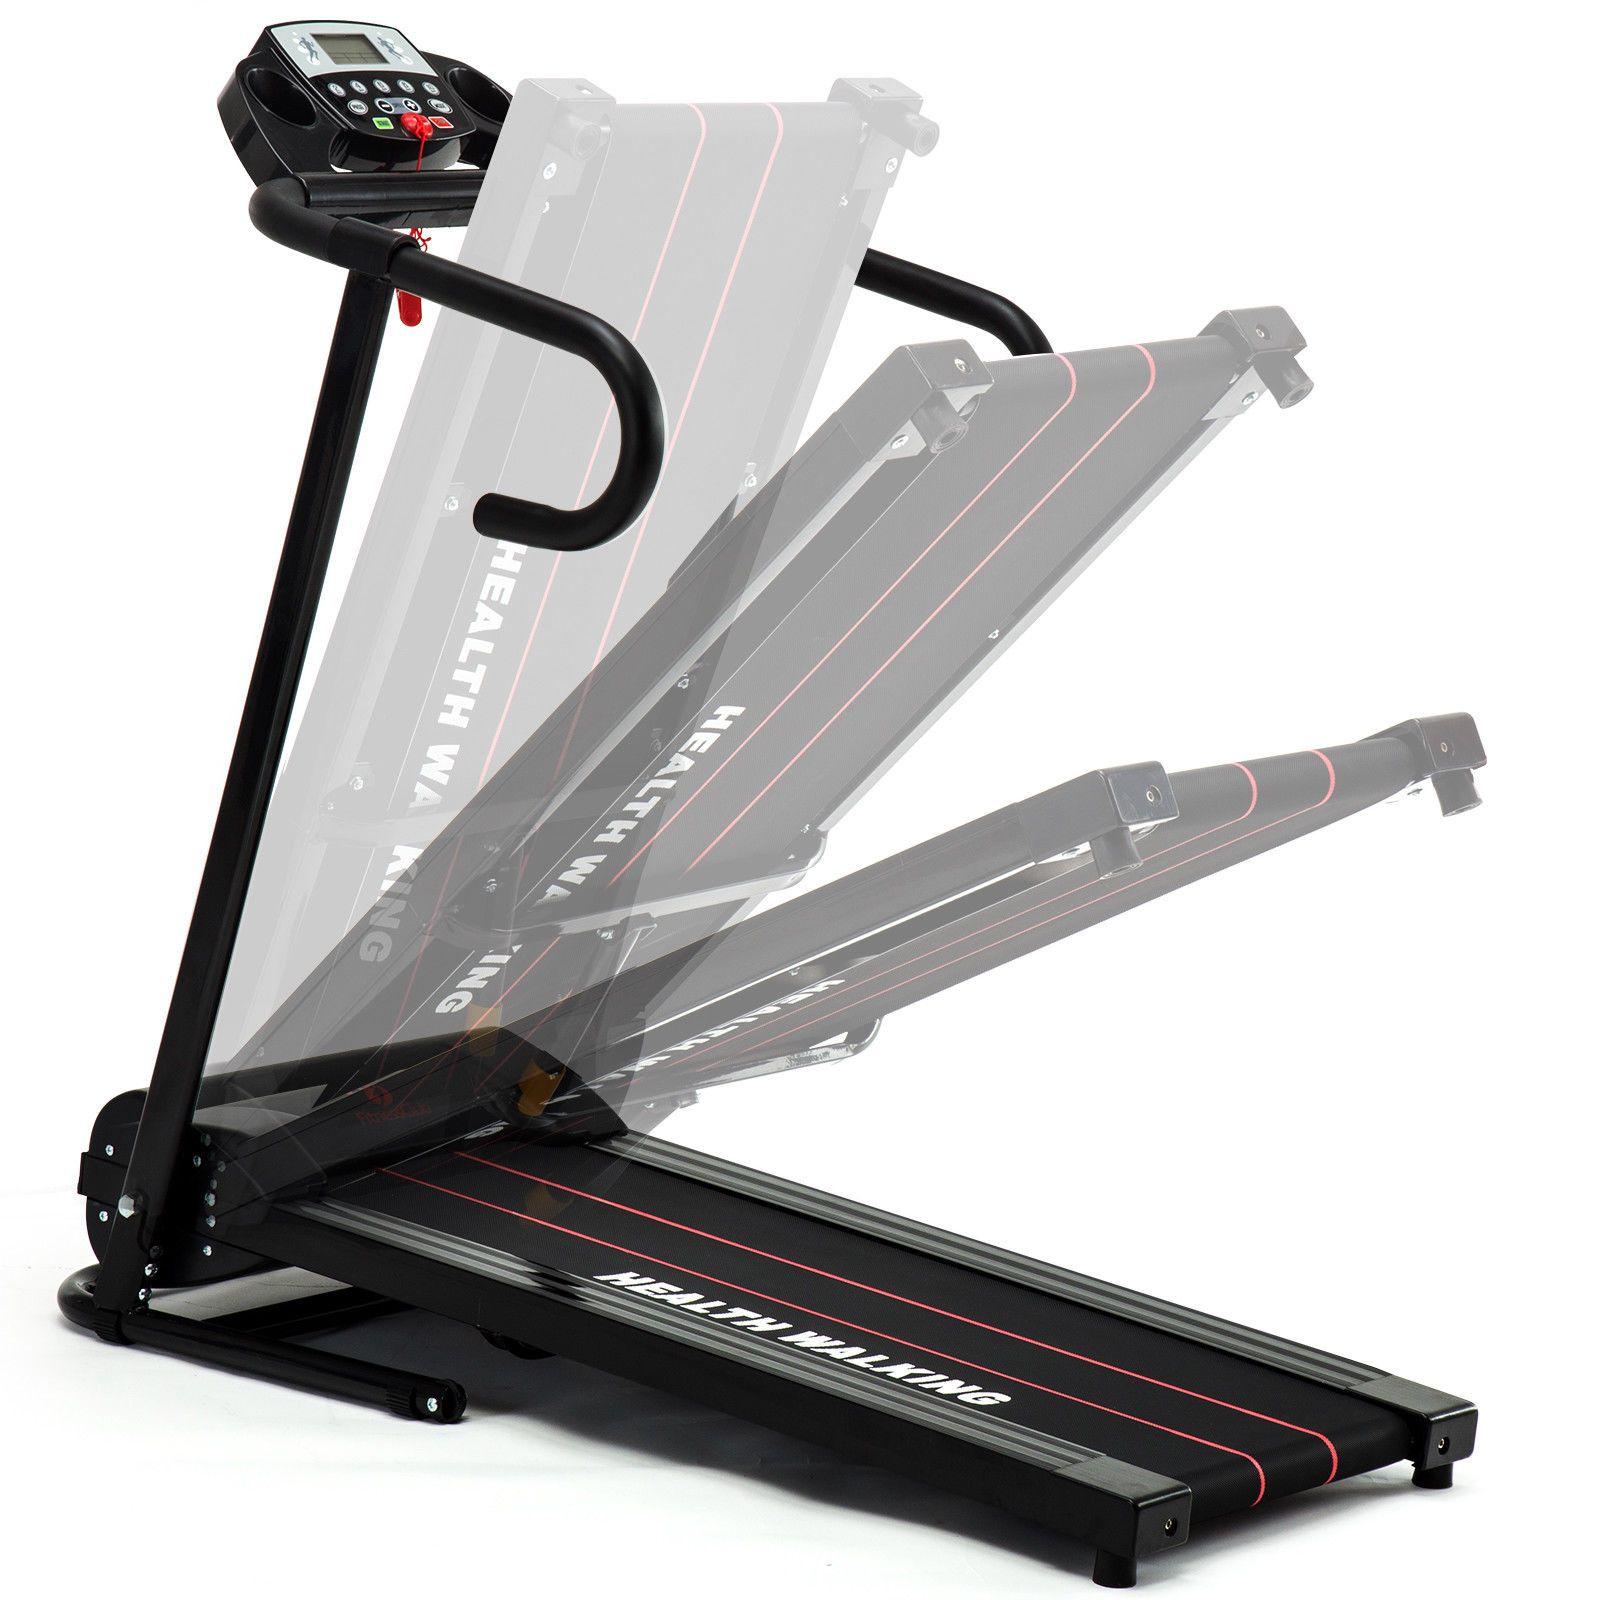 Folding 1100w Electric Motorized Treadmill Portable Running Fitness Machine Gym Workout Machines Running Workouts Treadmill